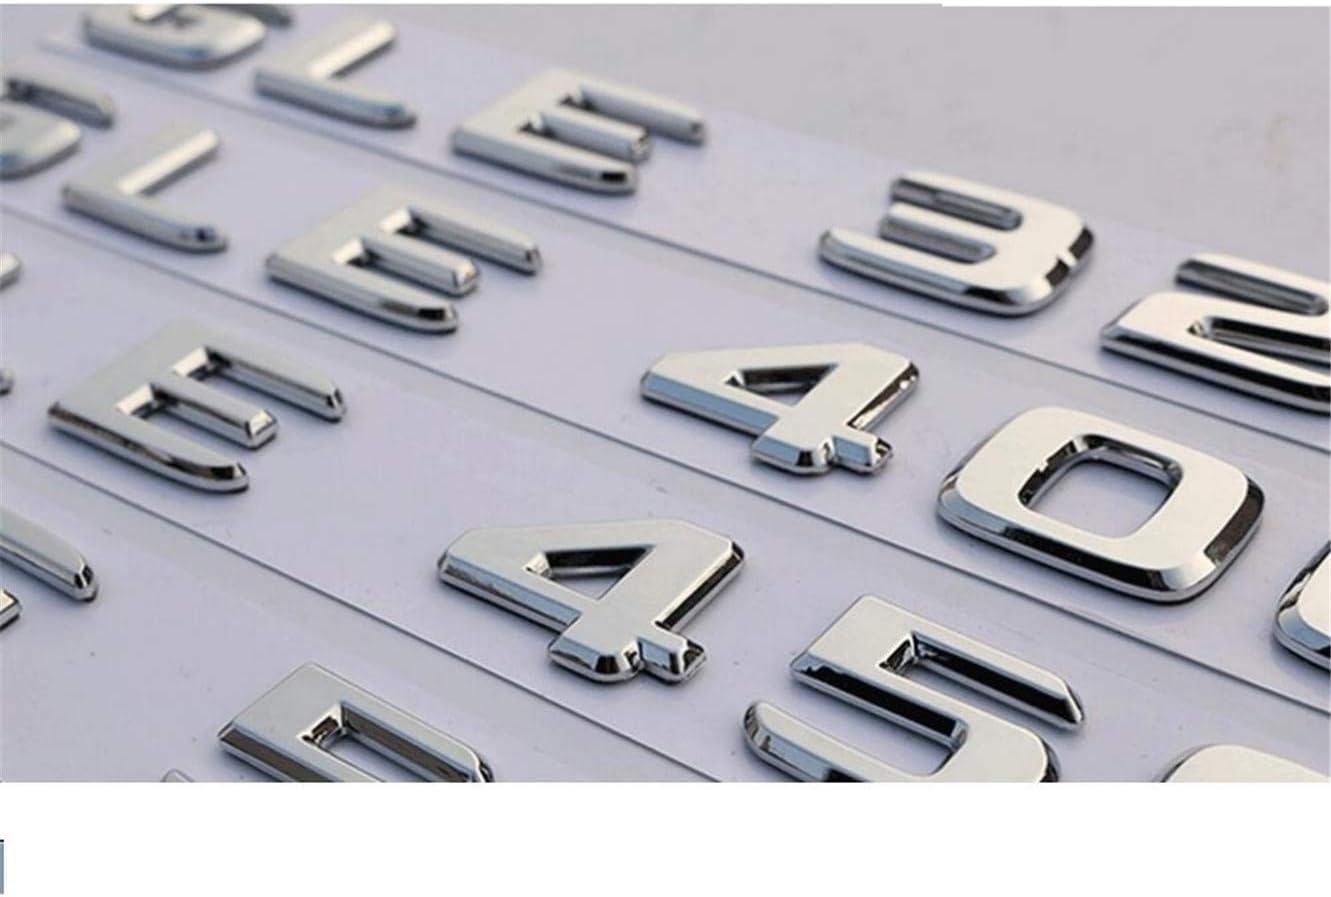 A200 Flat Chrome Rear Trunk Letters Badge Badges Emblem Emblems A45 AMG A180 A200 A250 A260 V8 BITURBO 4MATIC W176